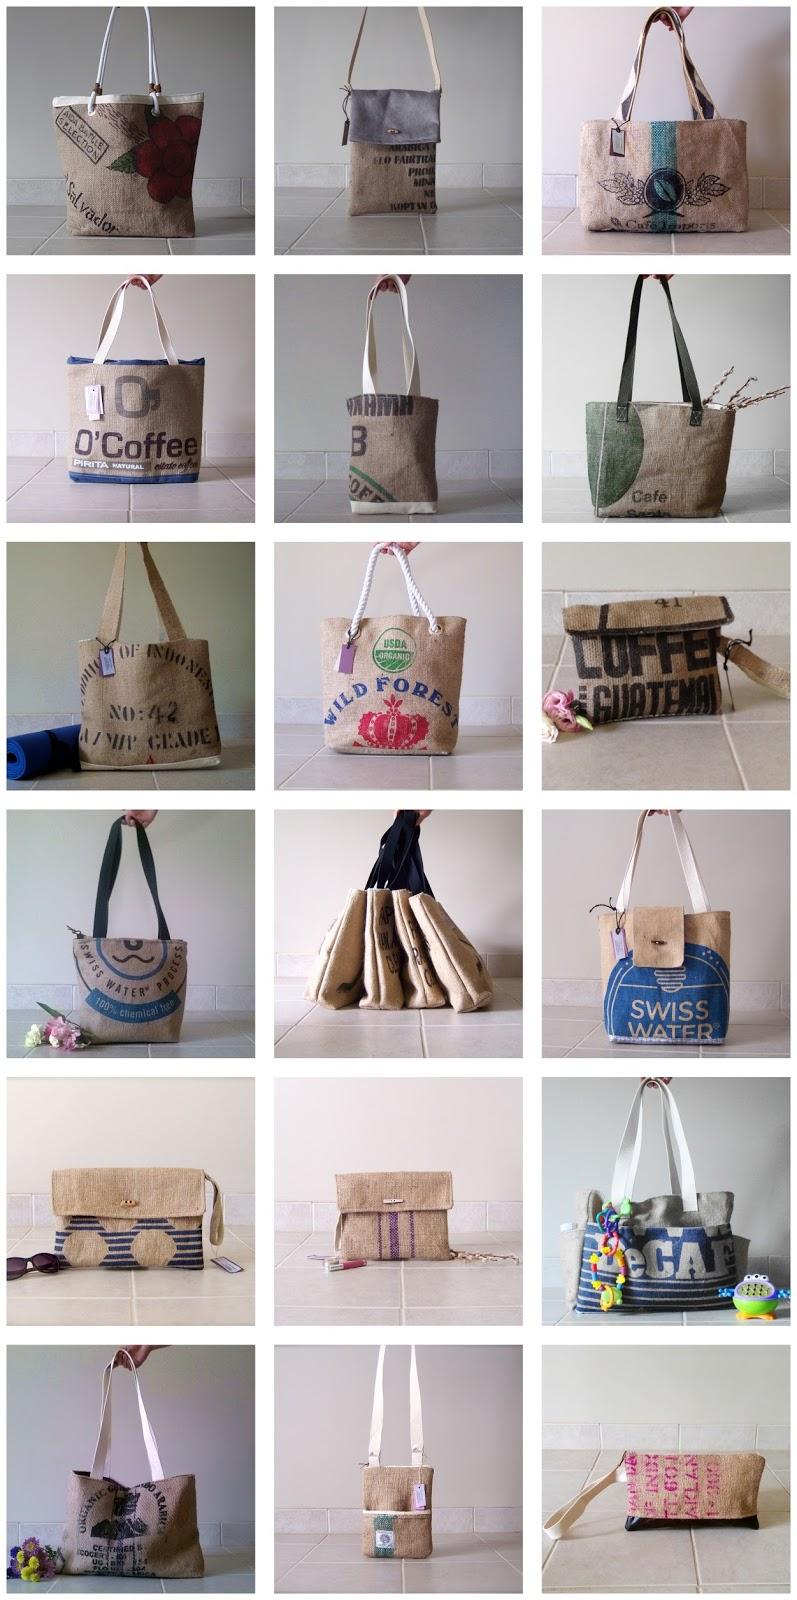 Grounds Burlap Bag Collection // linaandvi.blogspot.com // https://www.etsy.com/shop/LinaandVi